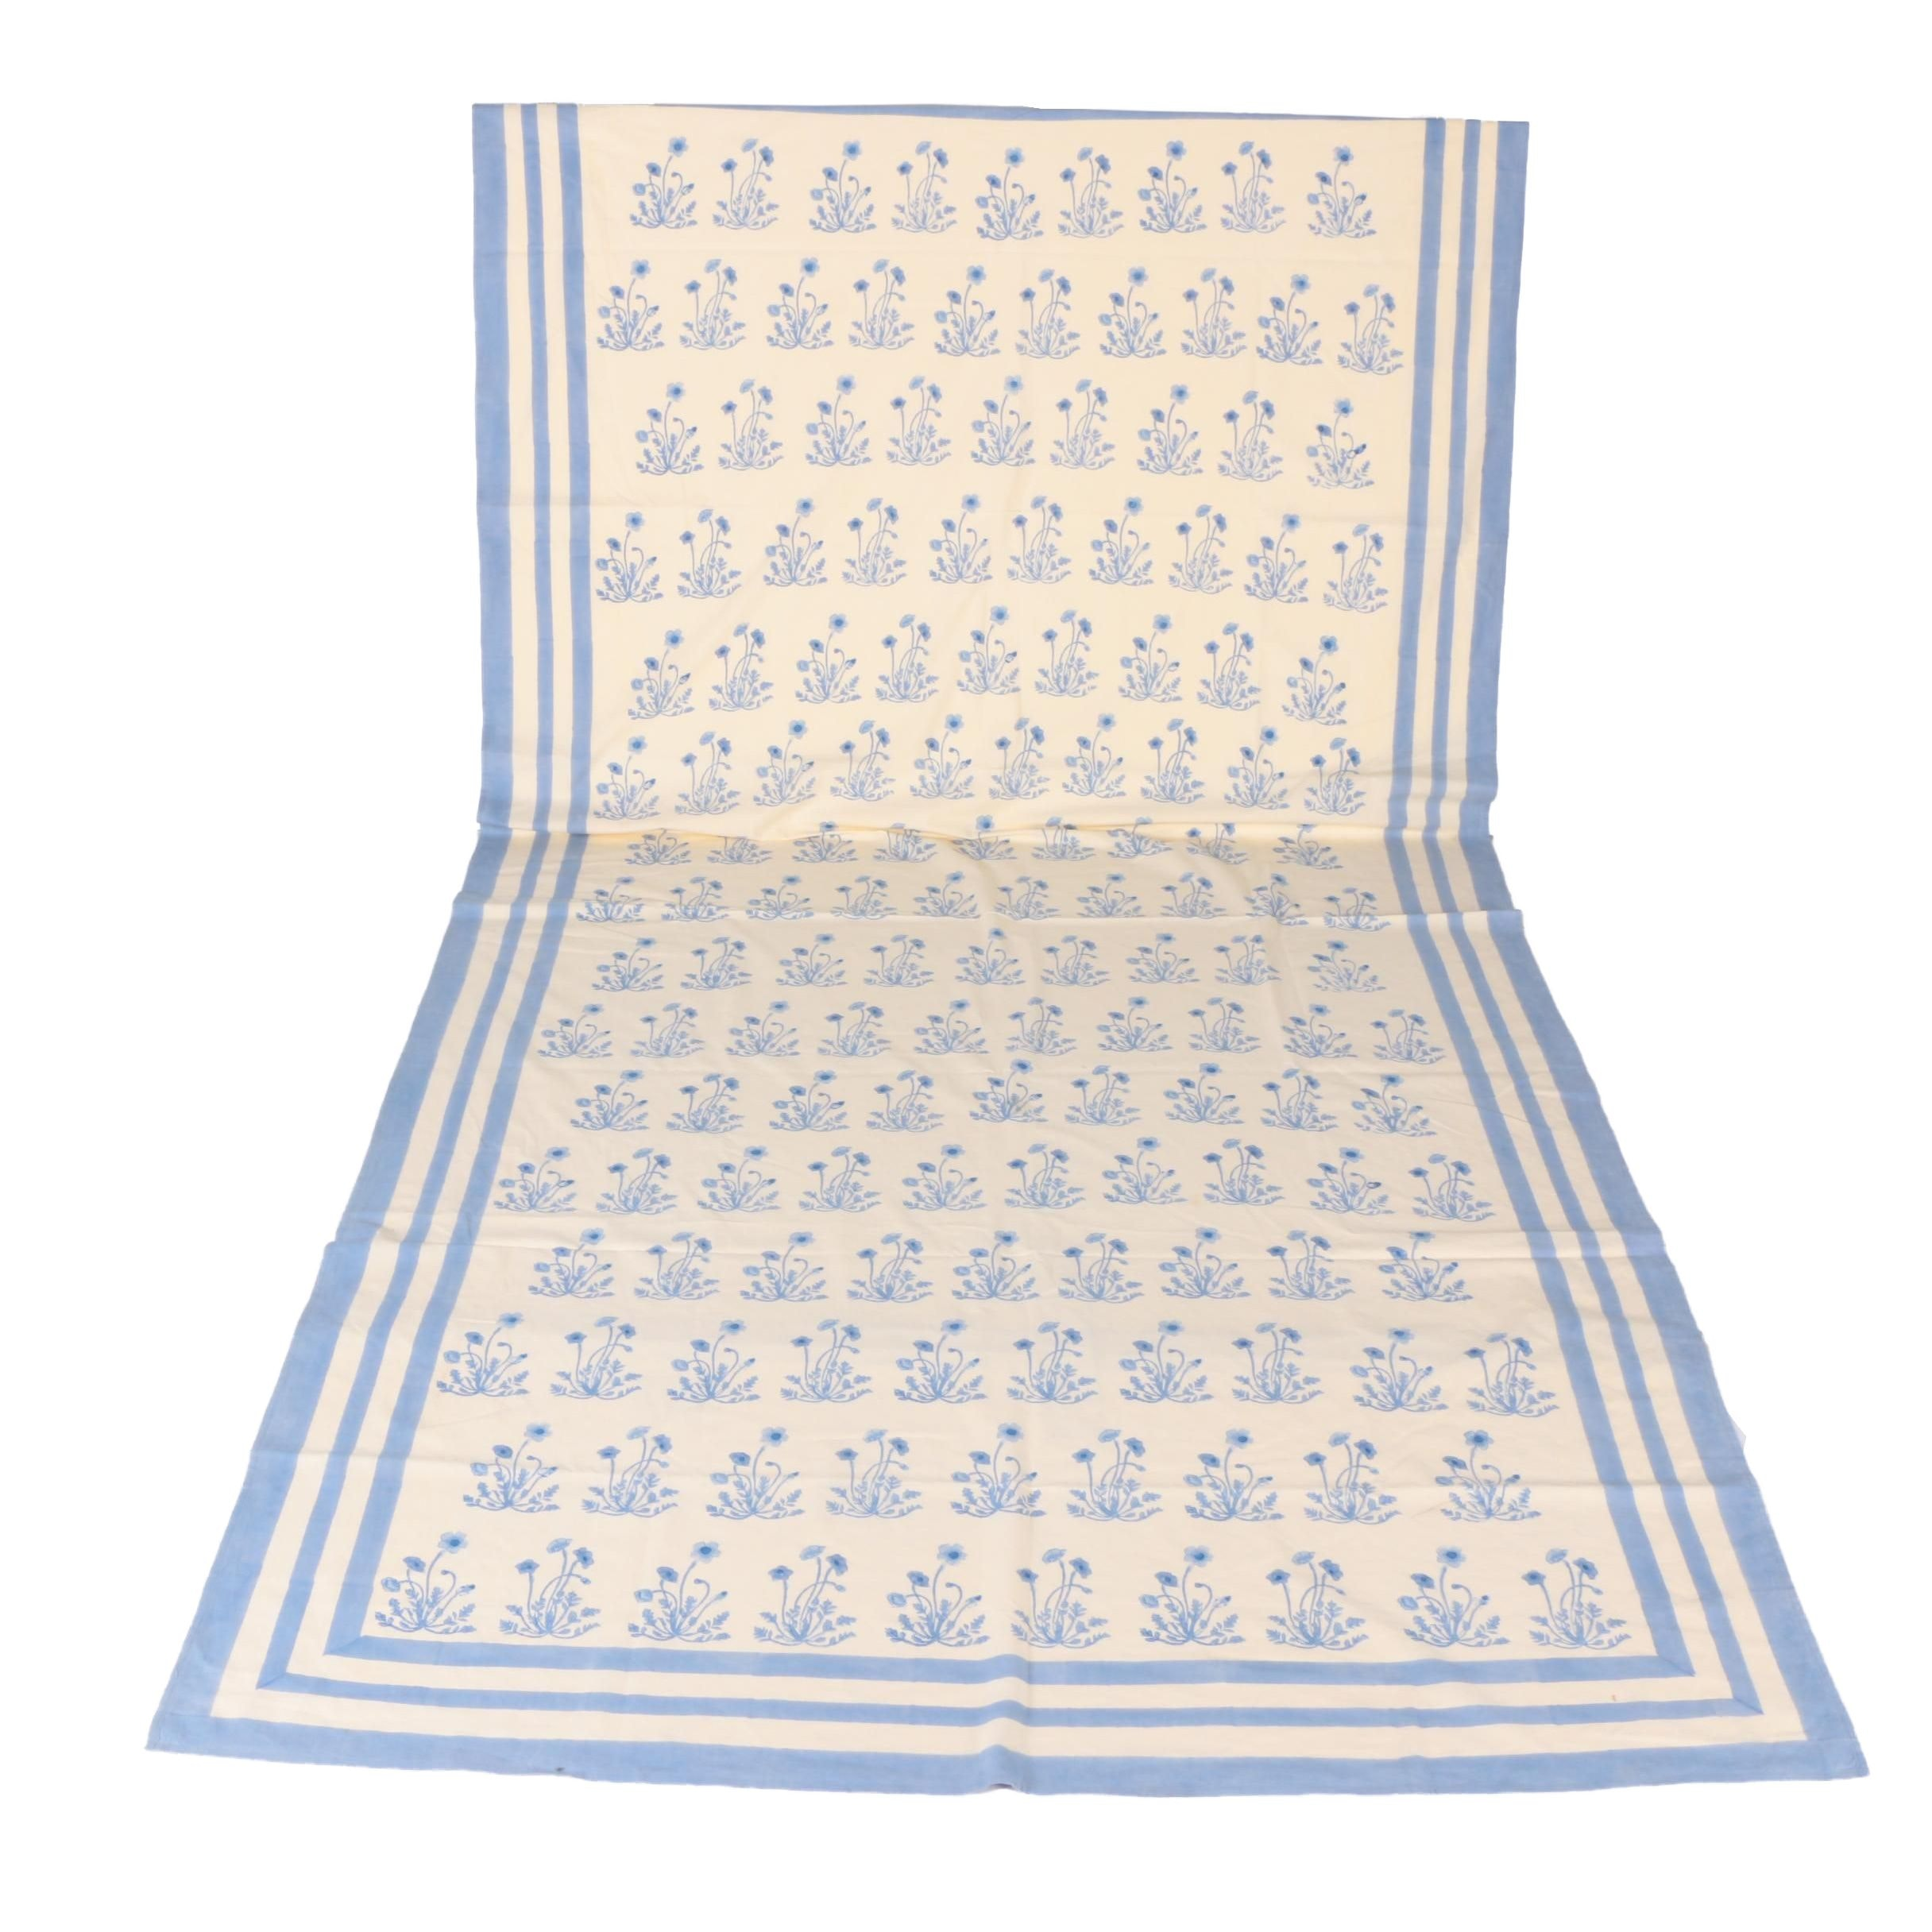 Vintage Couleur Nature Blue and White Floral Print Tablecloth